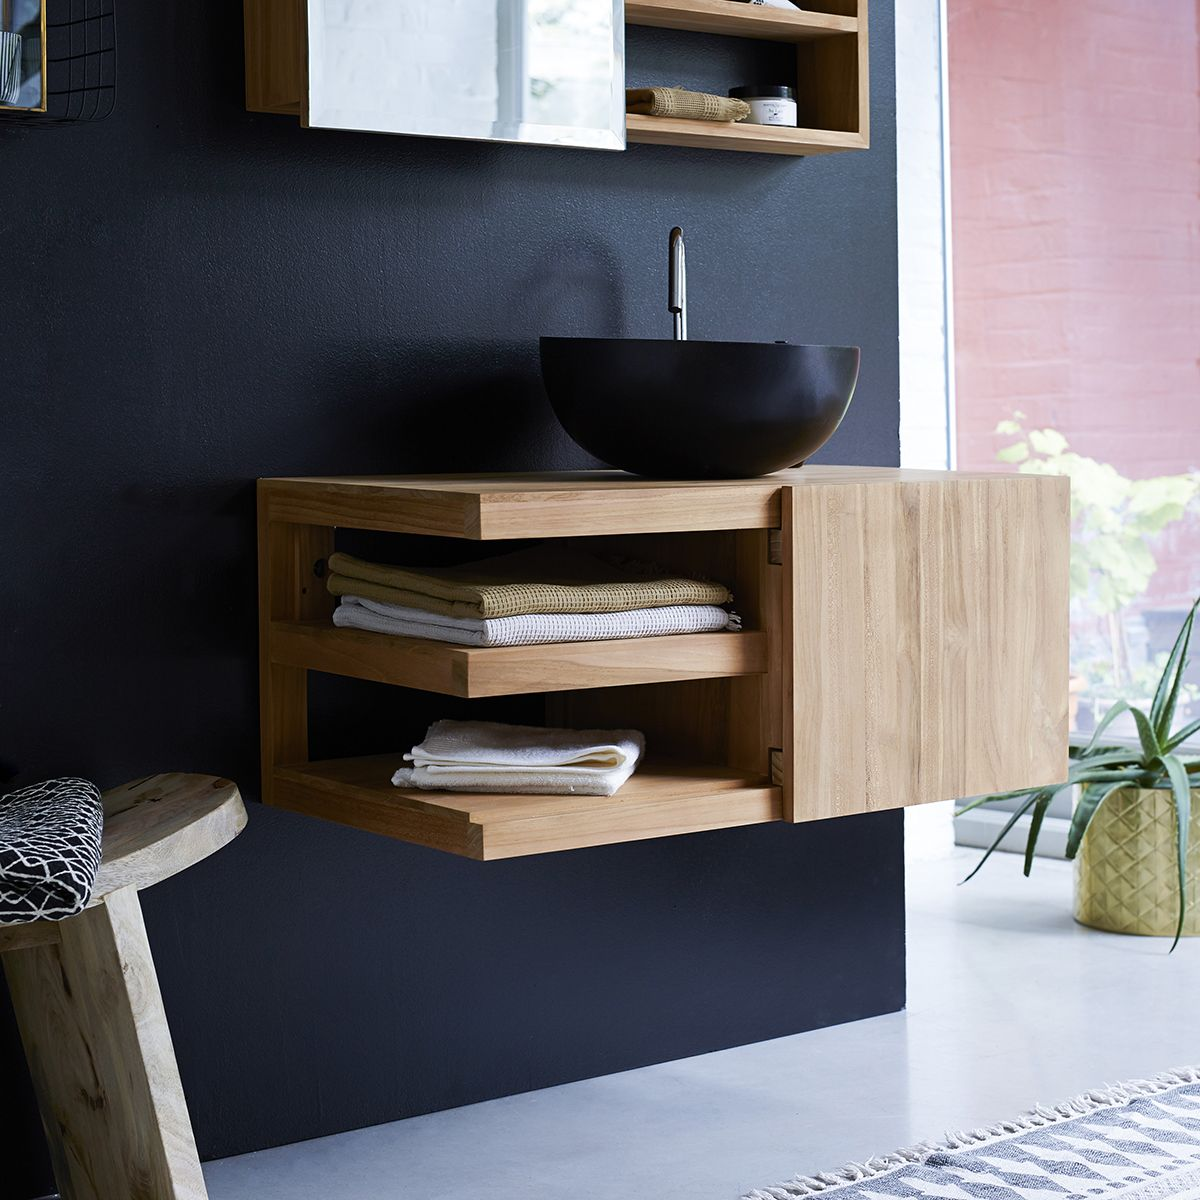 Wall Mounted Bathroom Vanity Cabinet Typo Teak Furniture In 2020 Bathroom Vanity Cabinets Teak Furniture Furniture